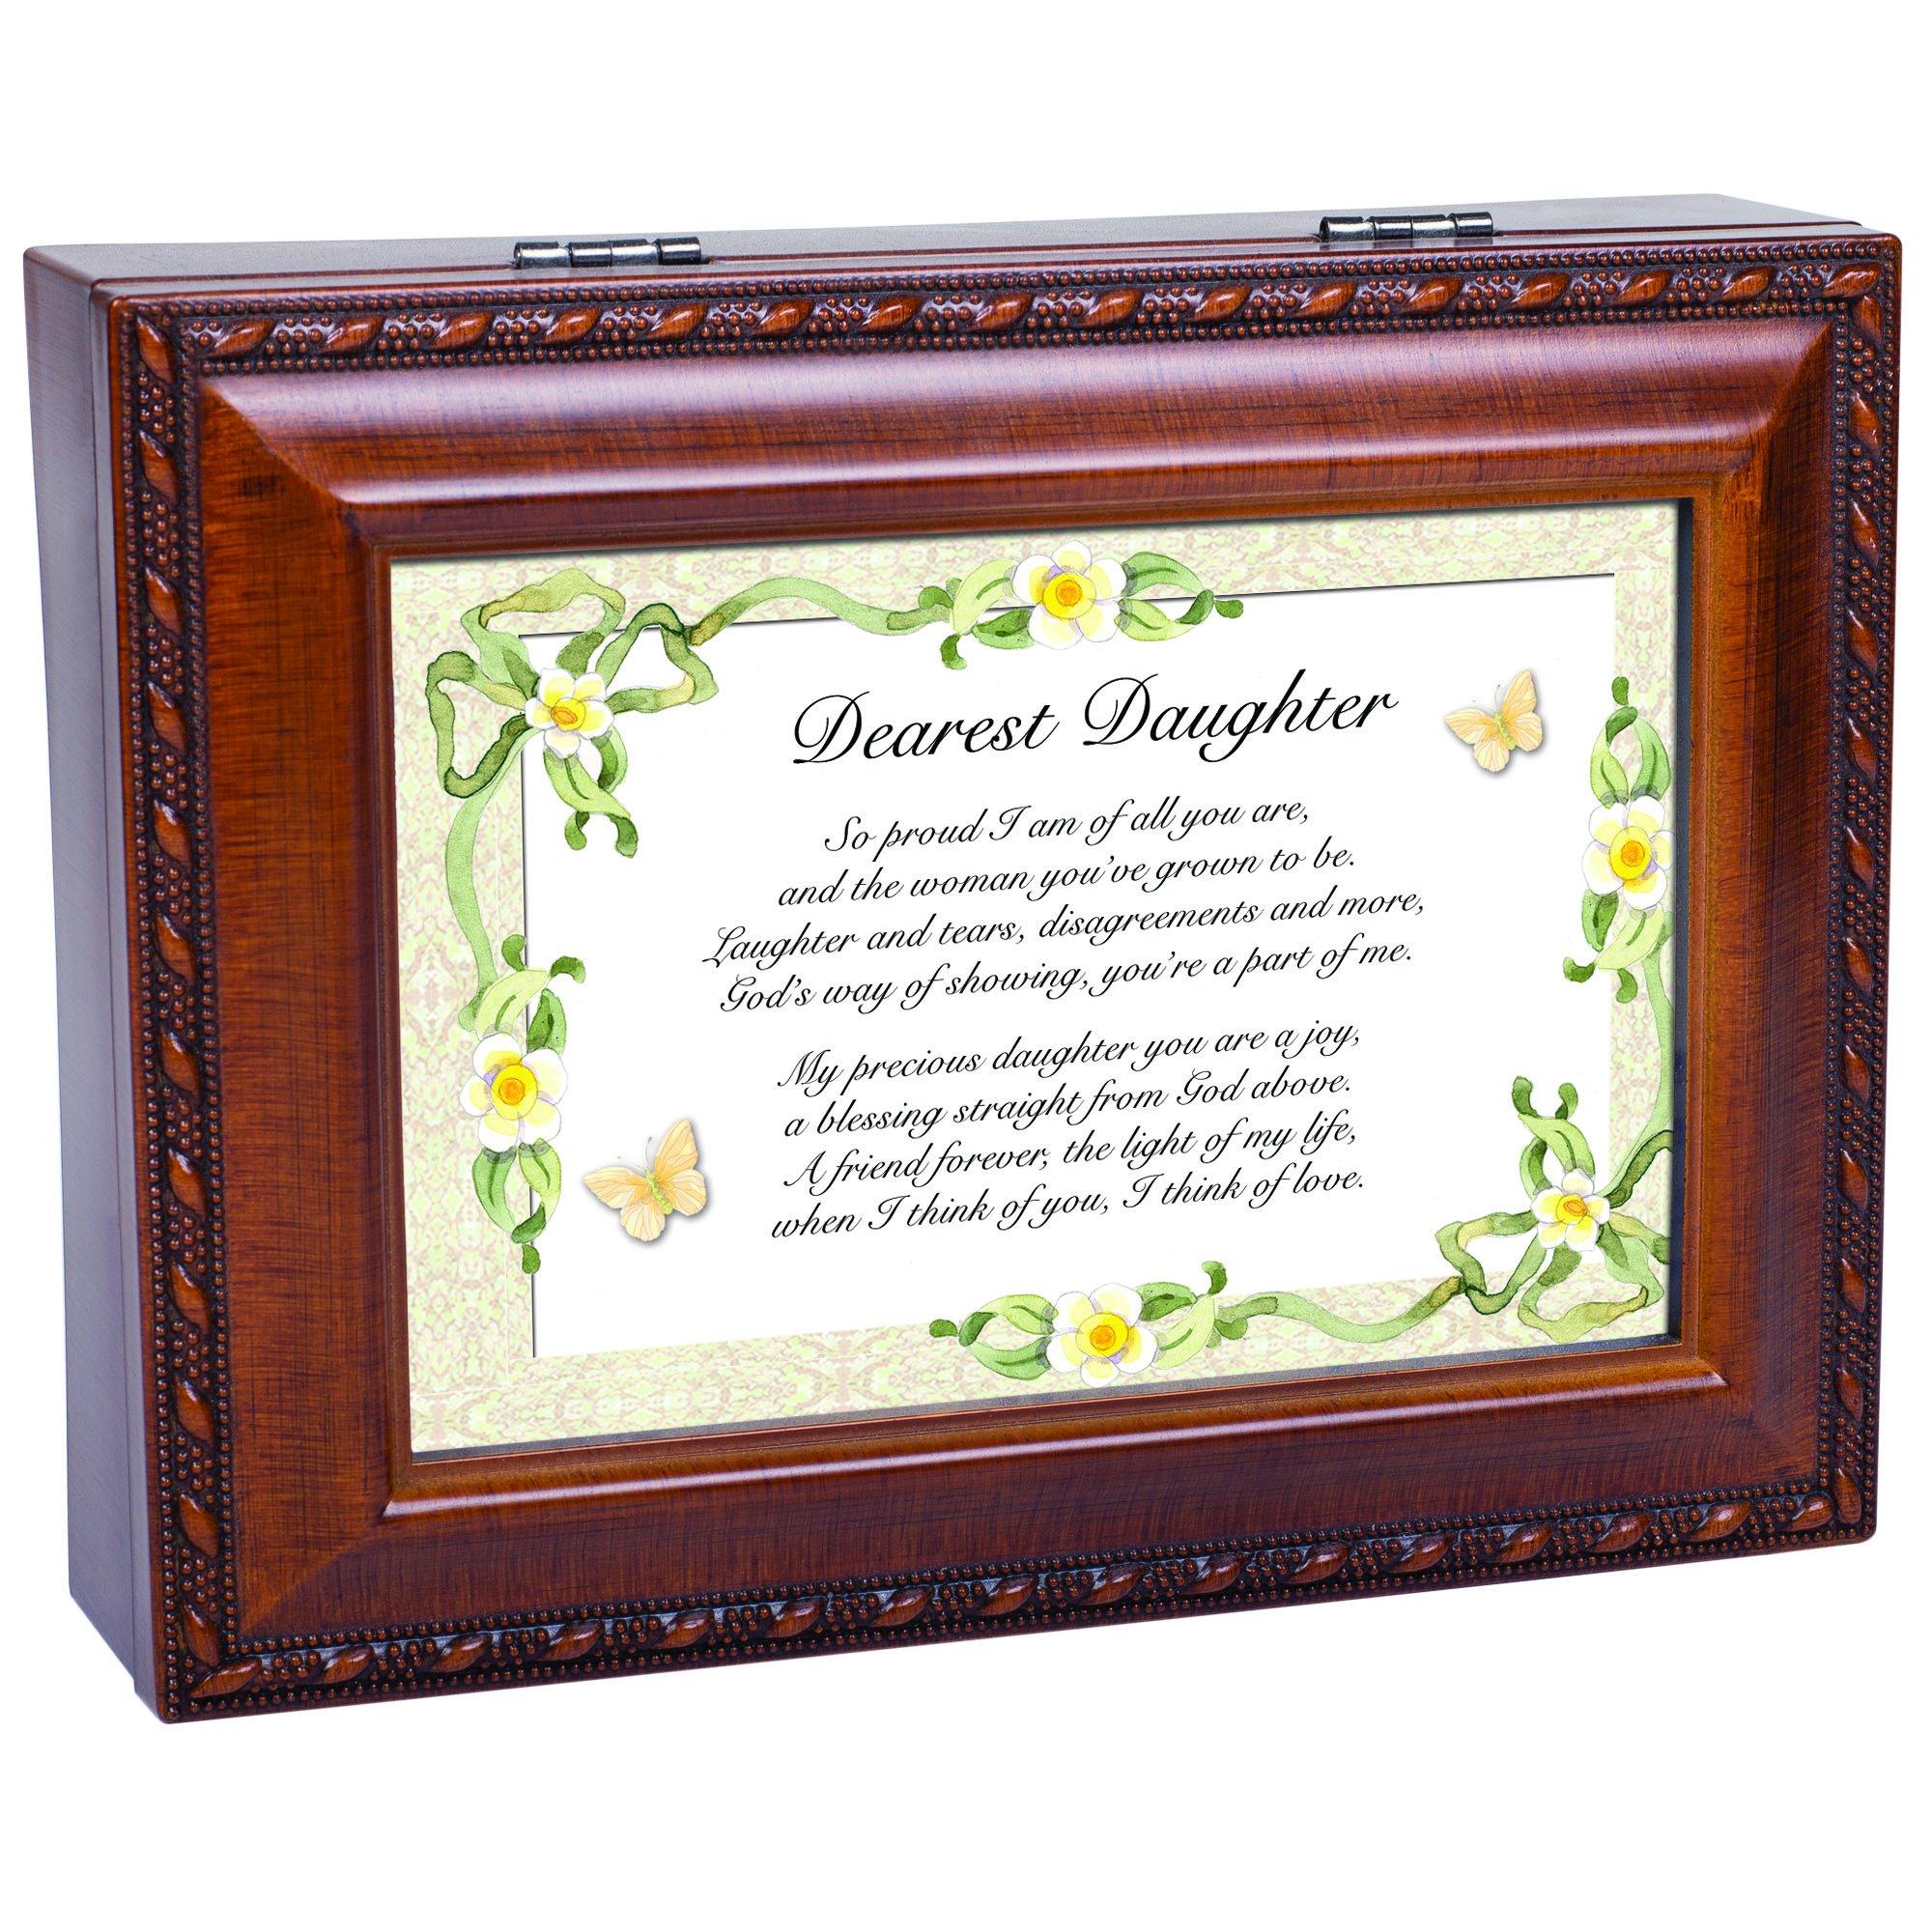 Cottage Garden Dearest Daughter Woodgrain Music Box Plays Light Up My Life by Cottage Garden (Image #7)